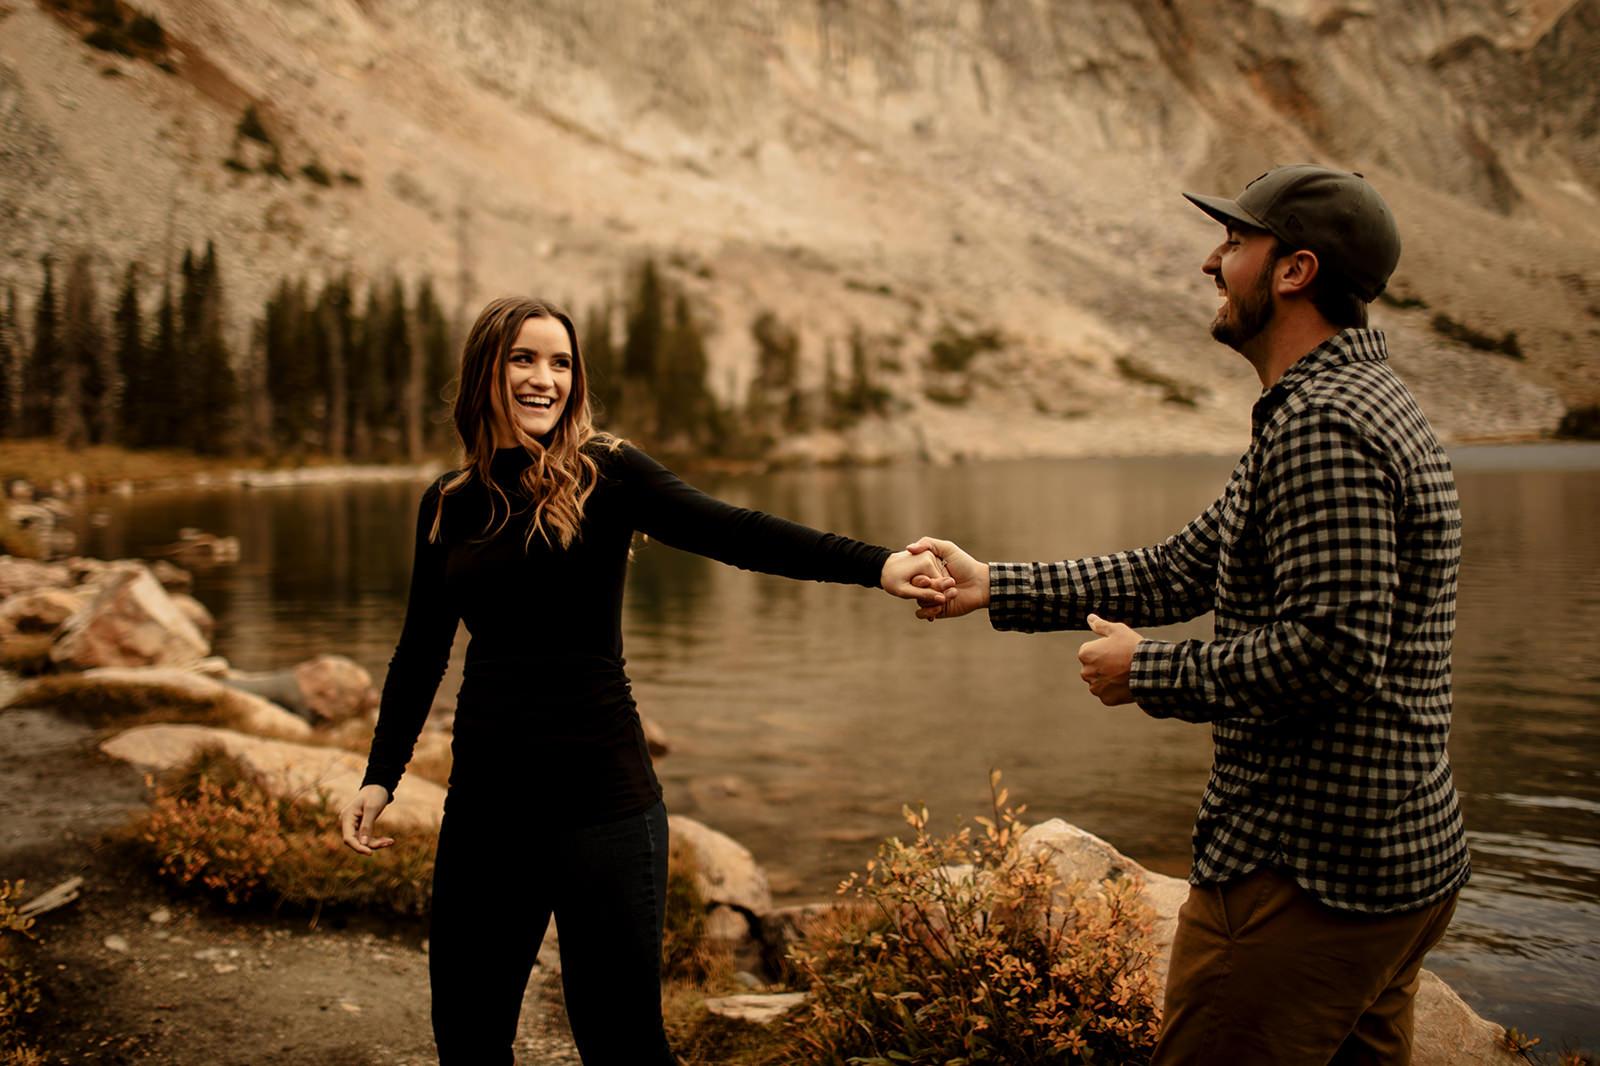 Liz Osban Photography Cheyenne Wyoming Engagement Wedding Photographer couple adventure elopement wedding laramie denver fort collins colorado rocky mountain national park15.jpg